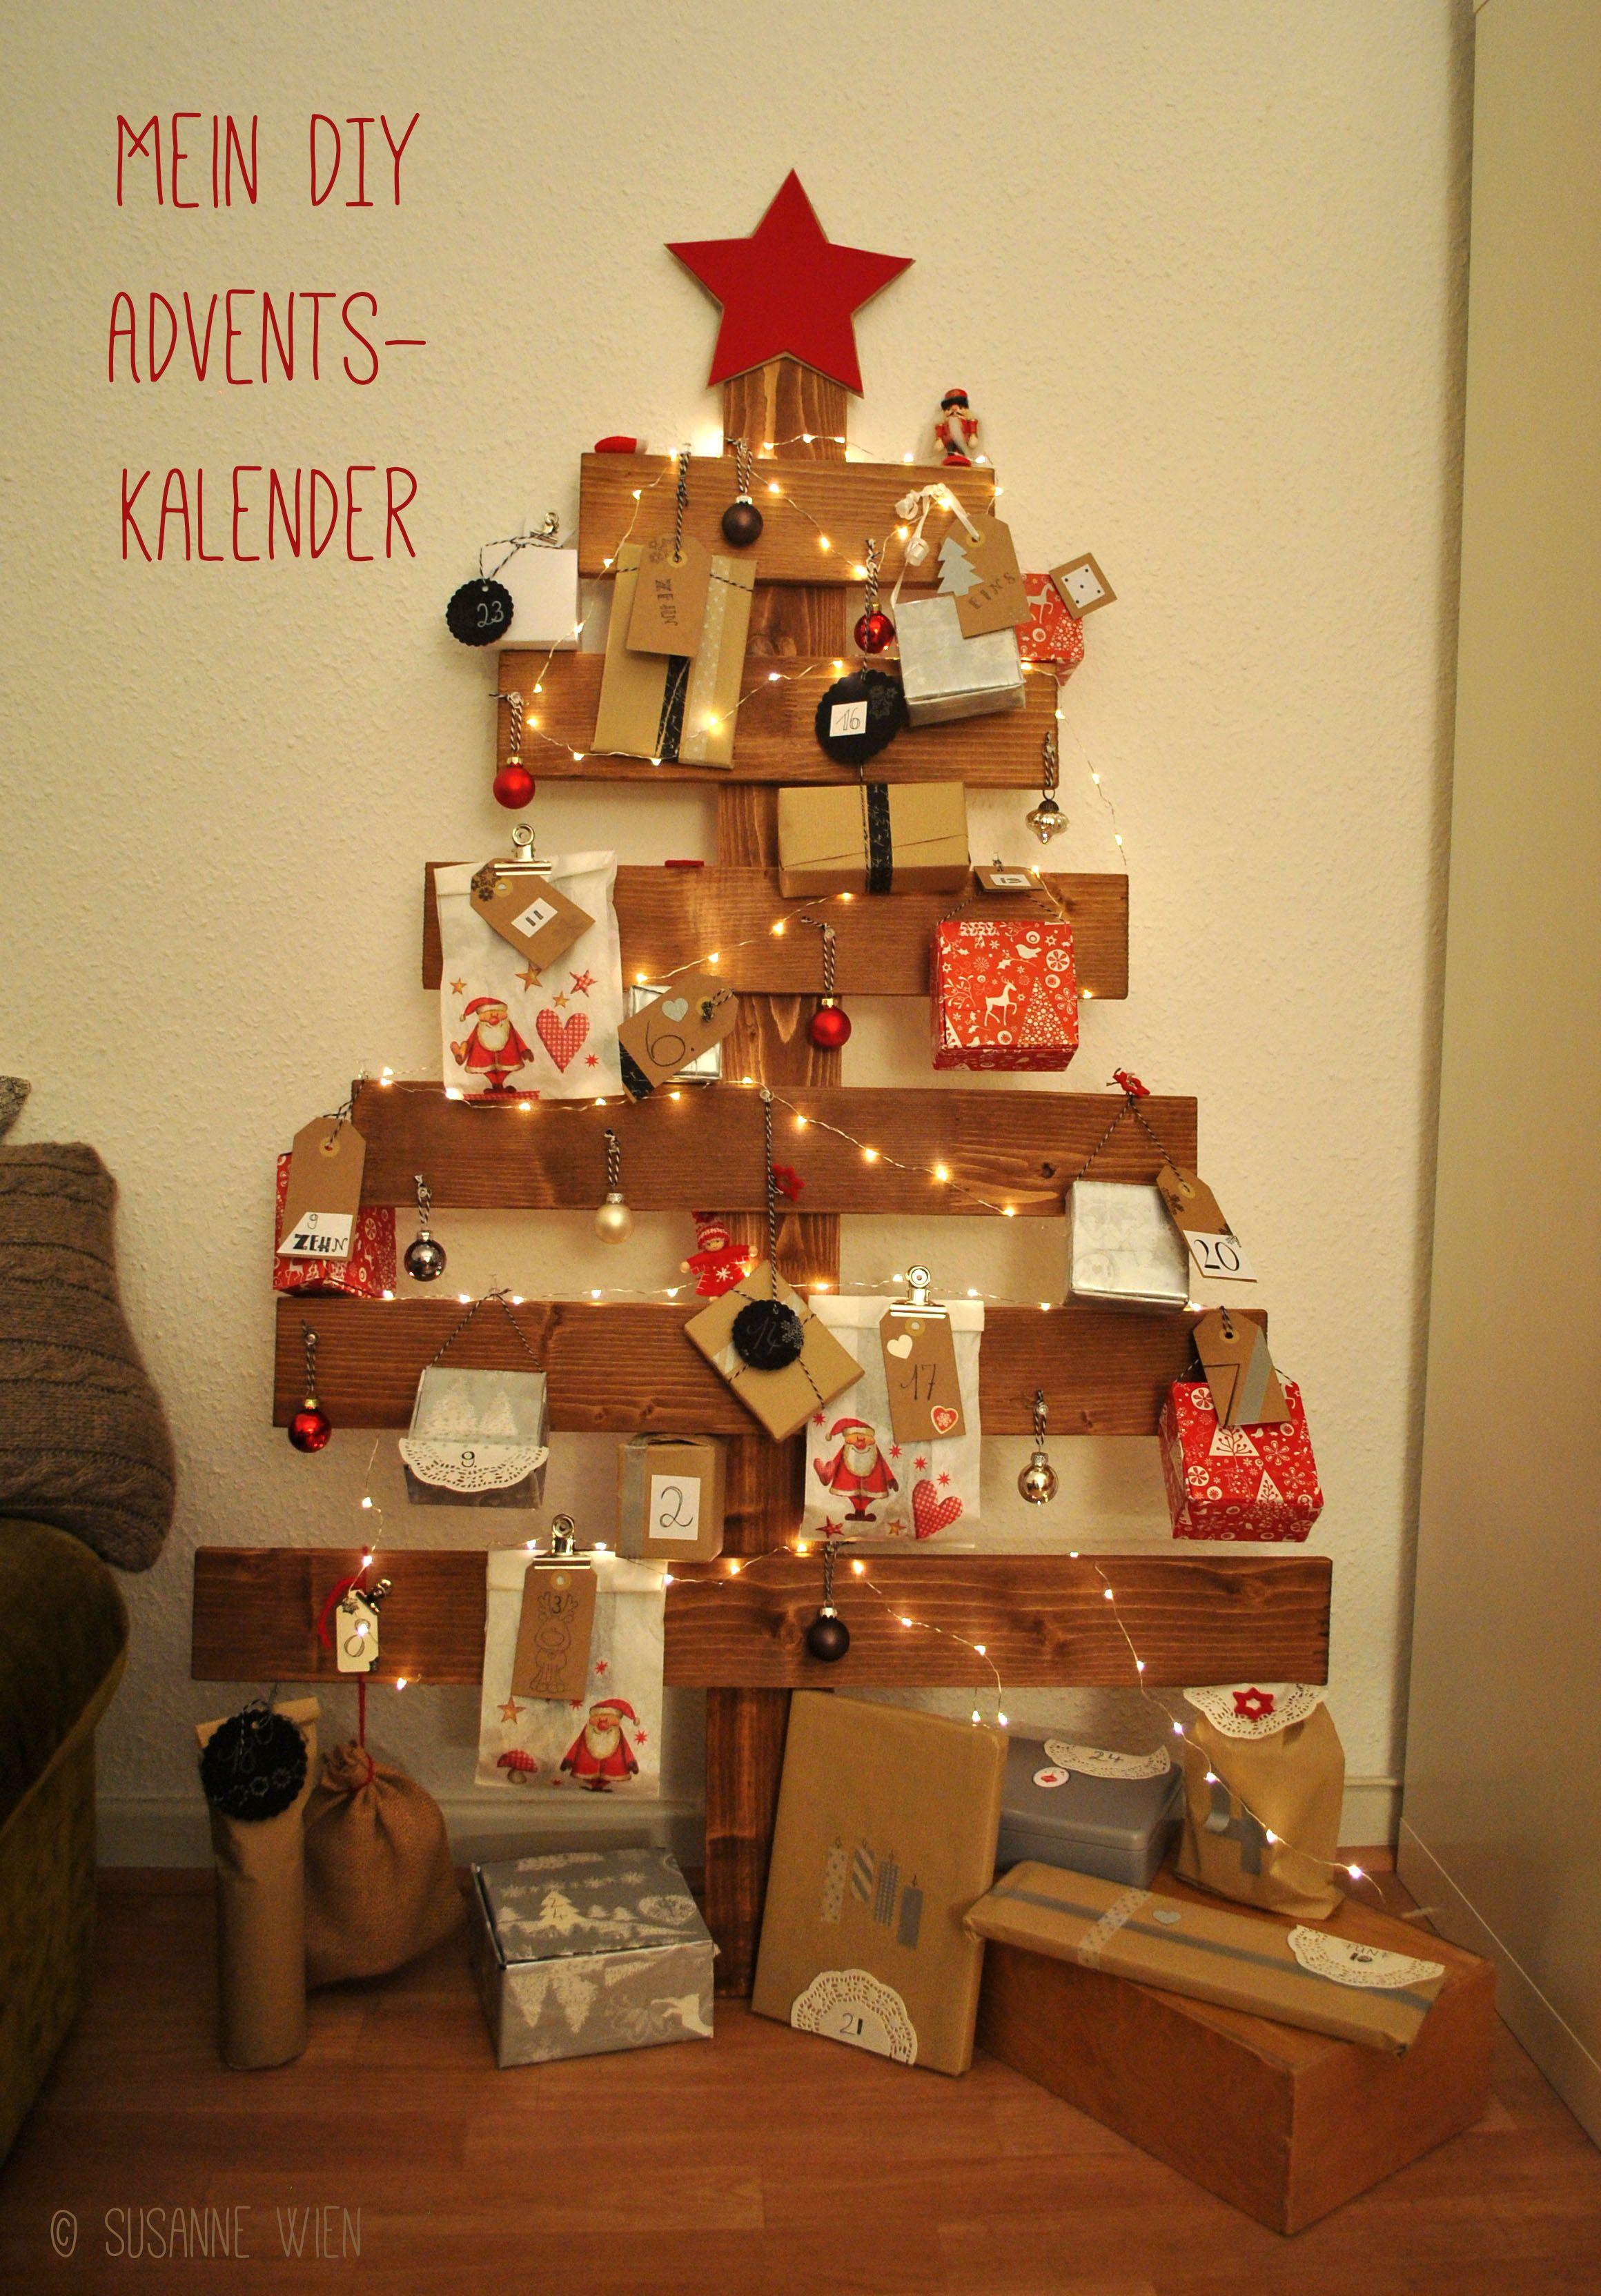 Mein #DIY #Adventskalender Aus Einem Alten Lattenrost. #Christmas #Upcycling